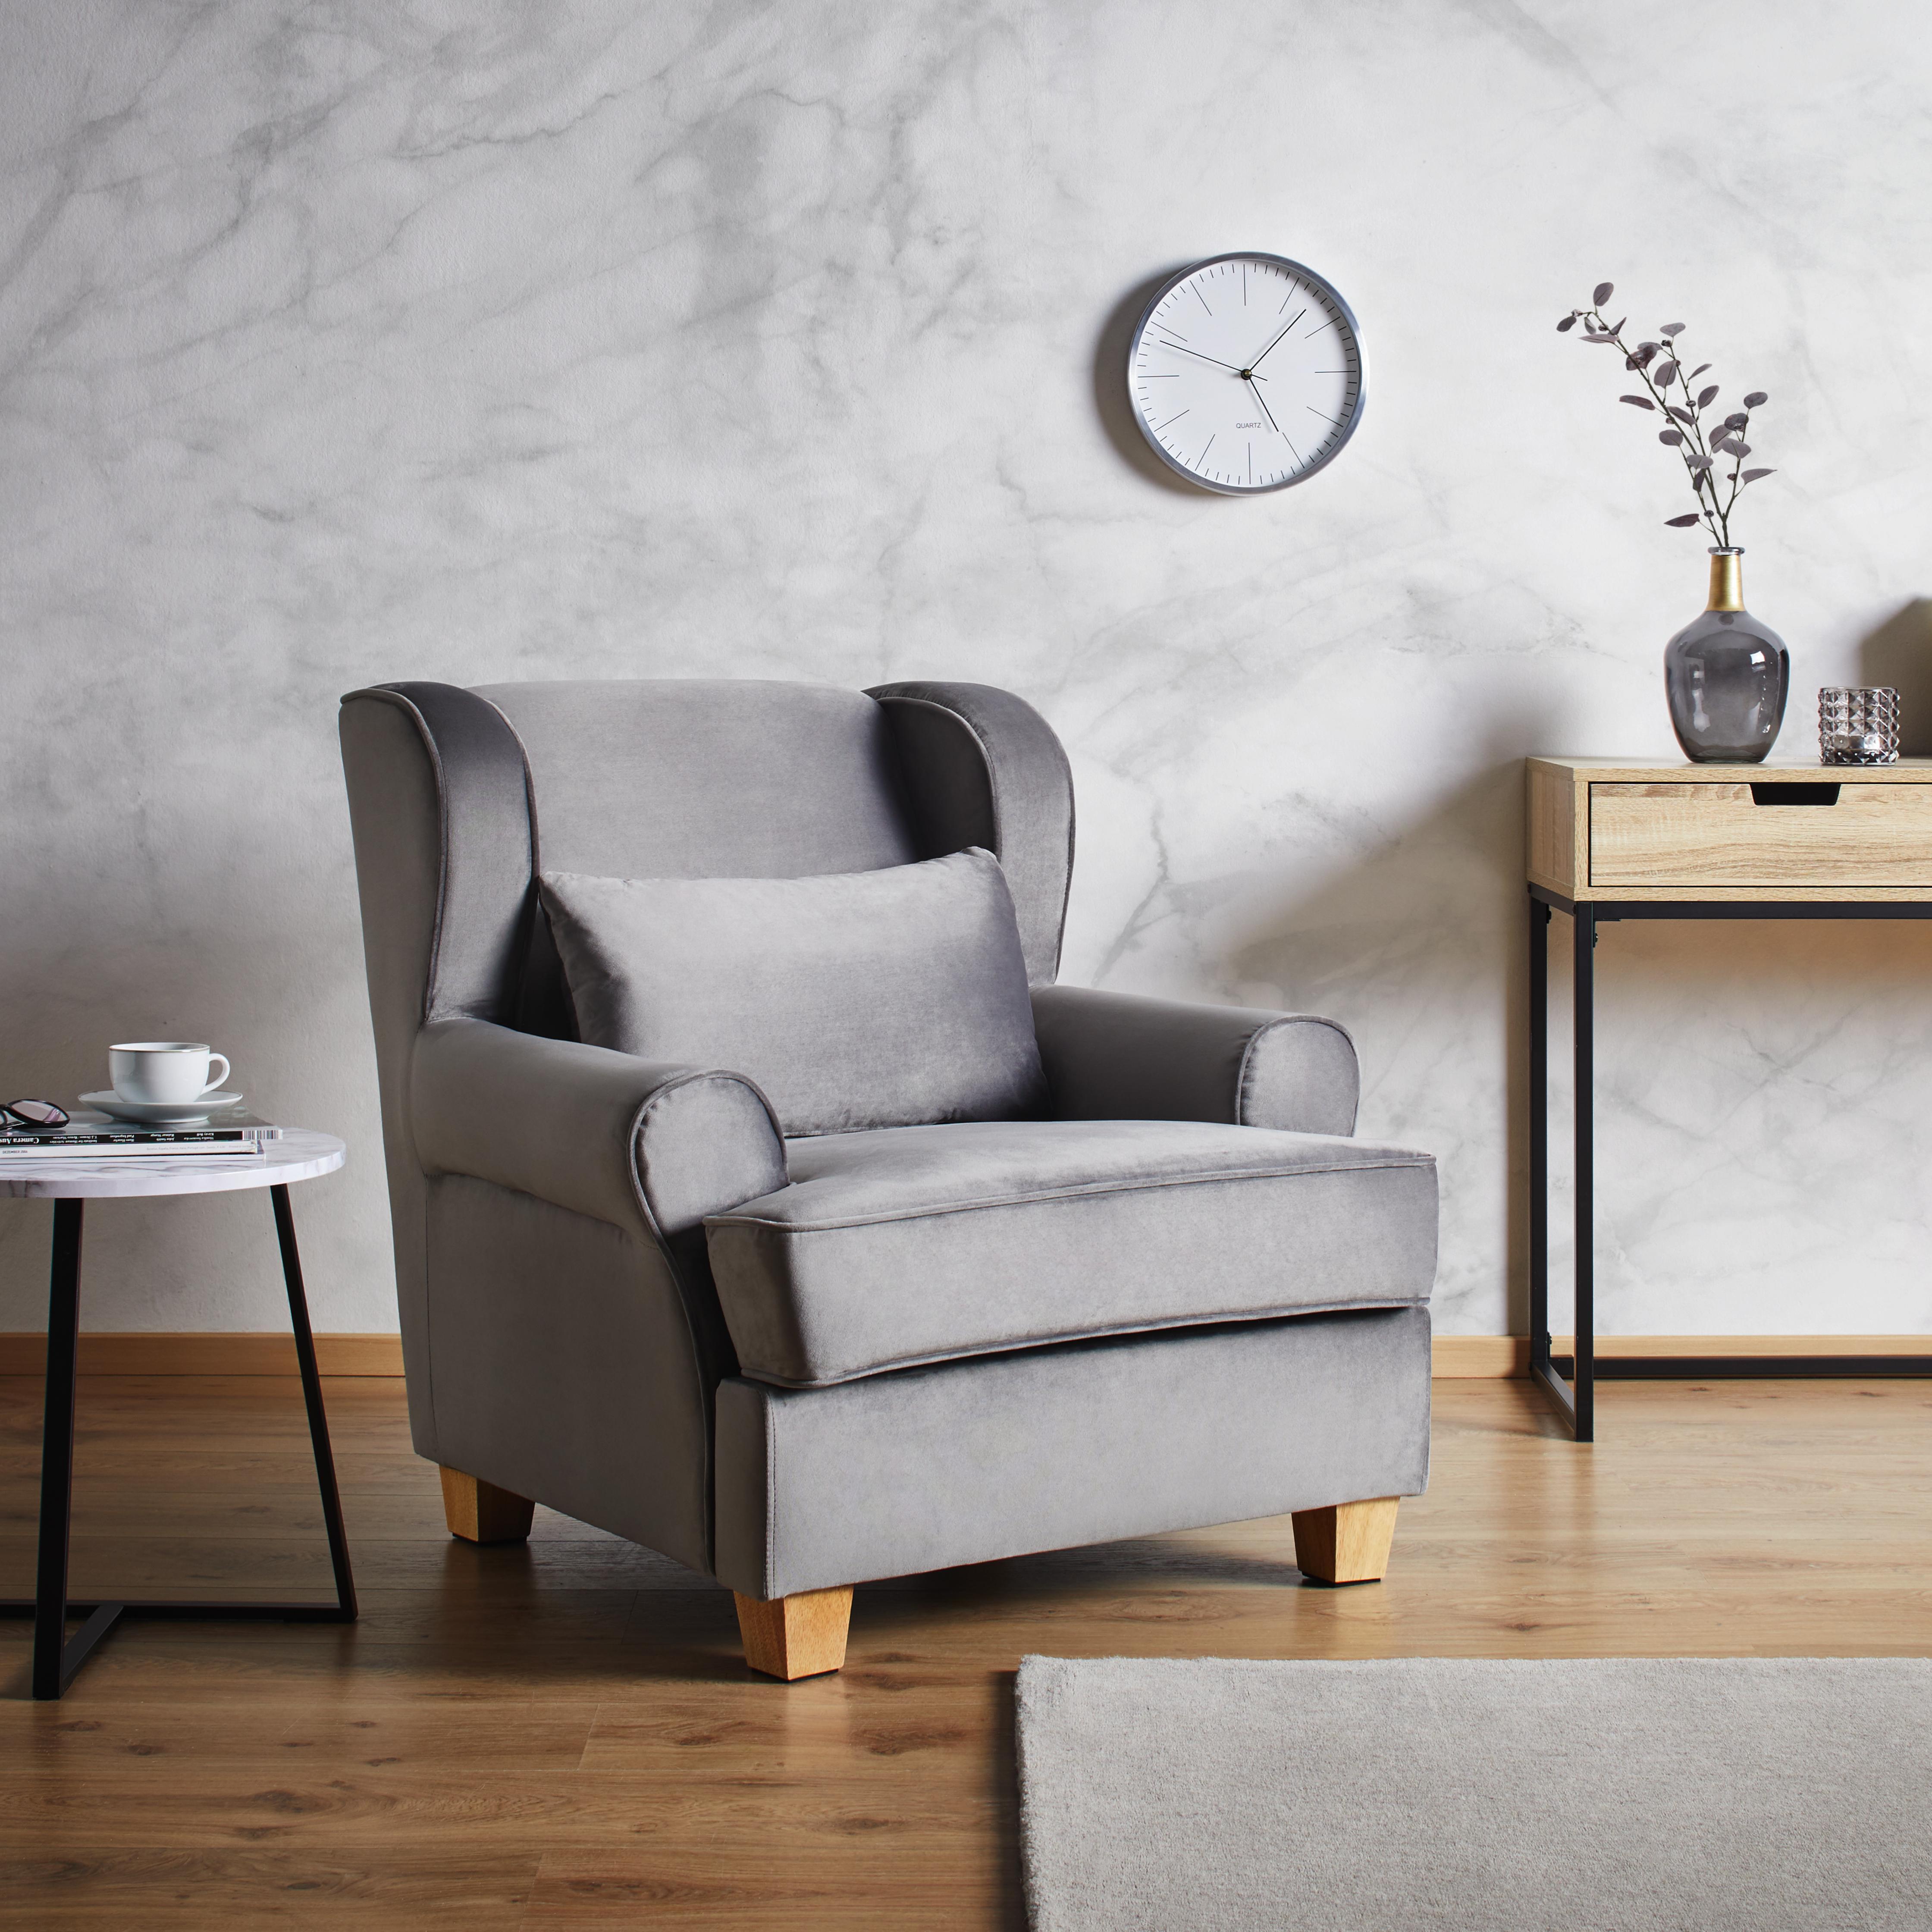 fernsehsessel in grau online bestellen. Black Bedroom Furniture Sets. Home Design Ideas